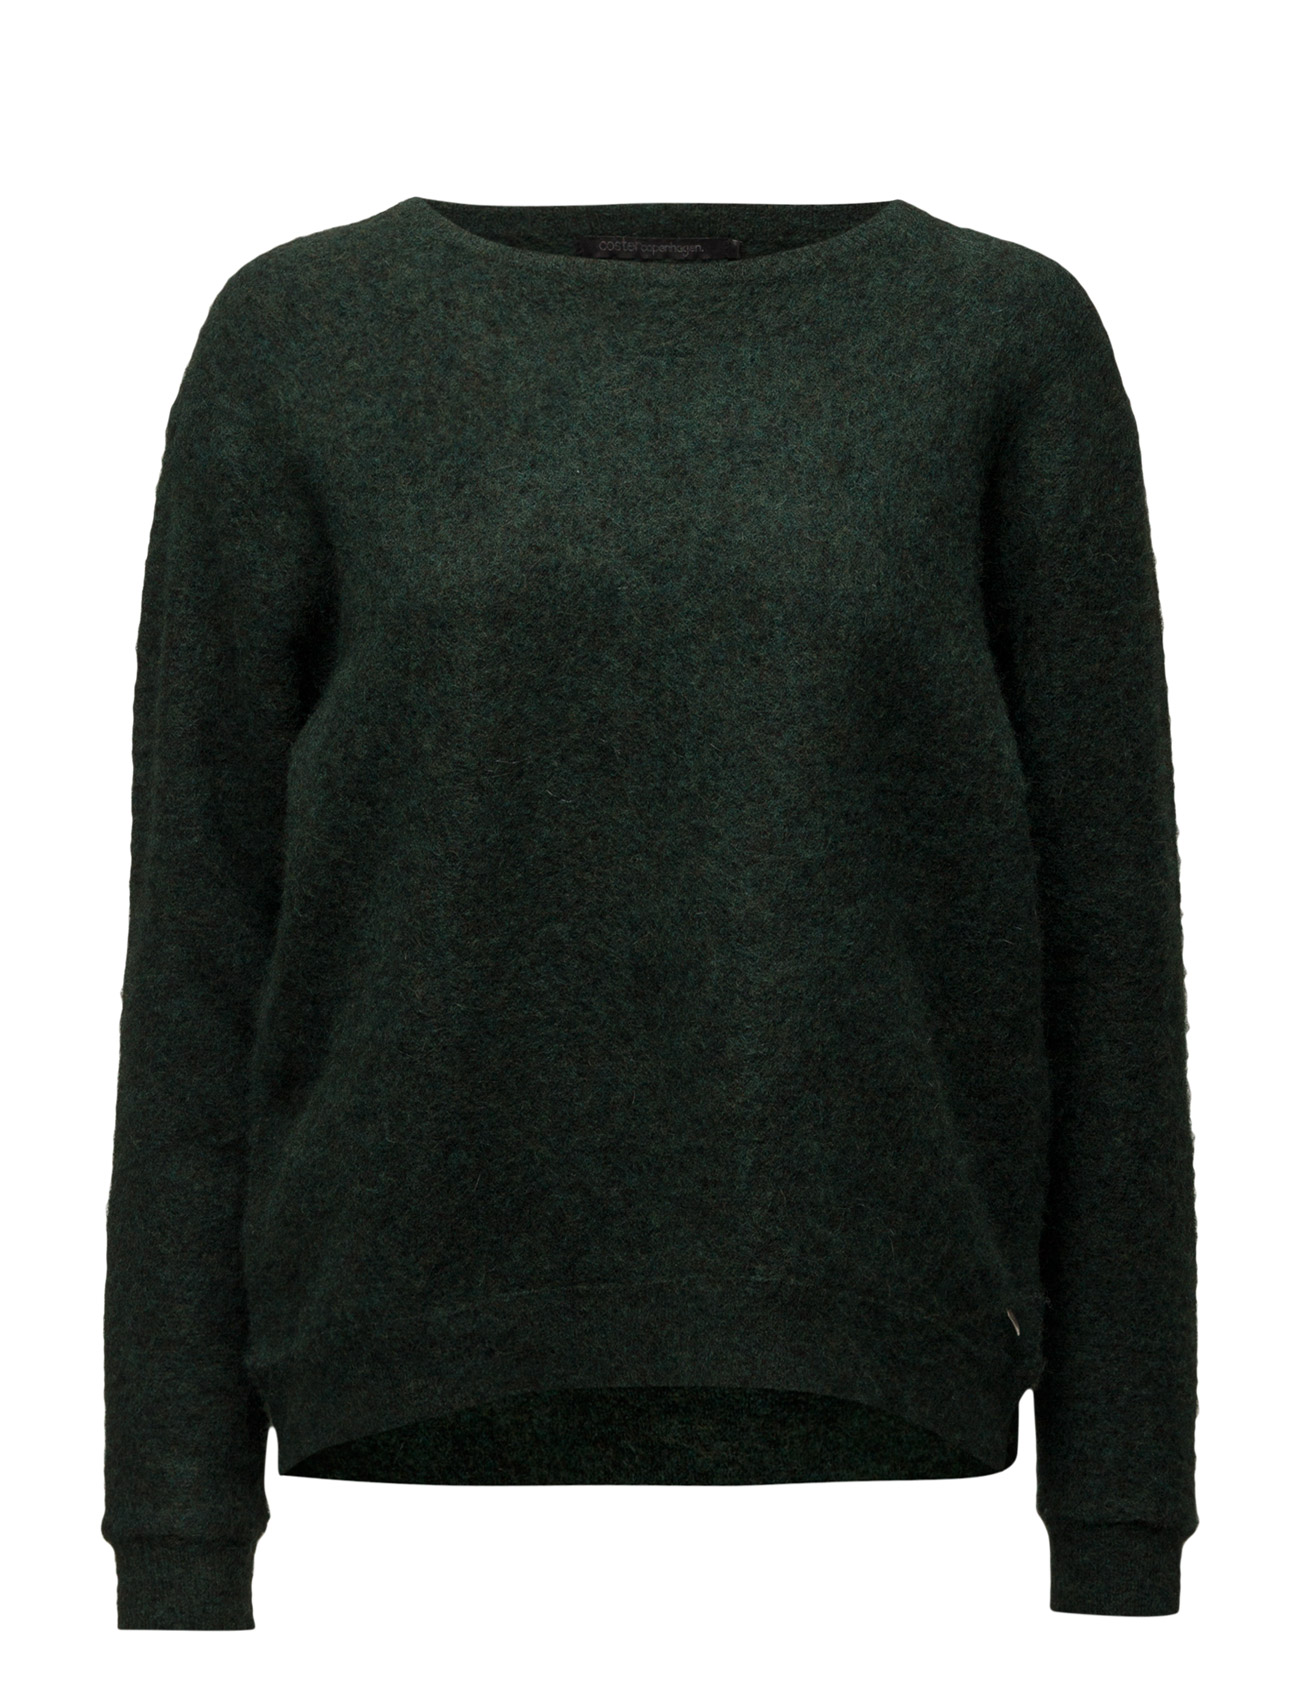 Mohair Knit Top Round Neck Coster Copenhagen Sweatshirts til Kvinder i Bordeaux Melange